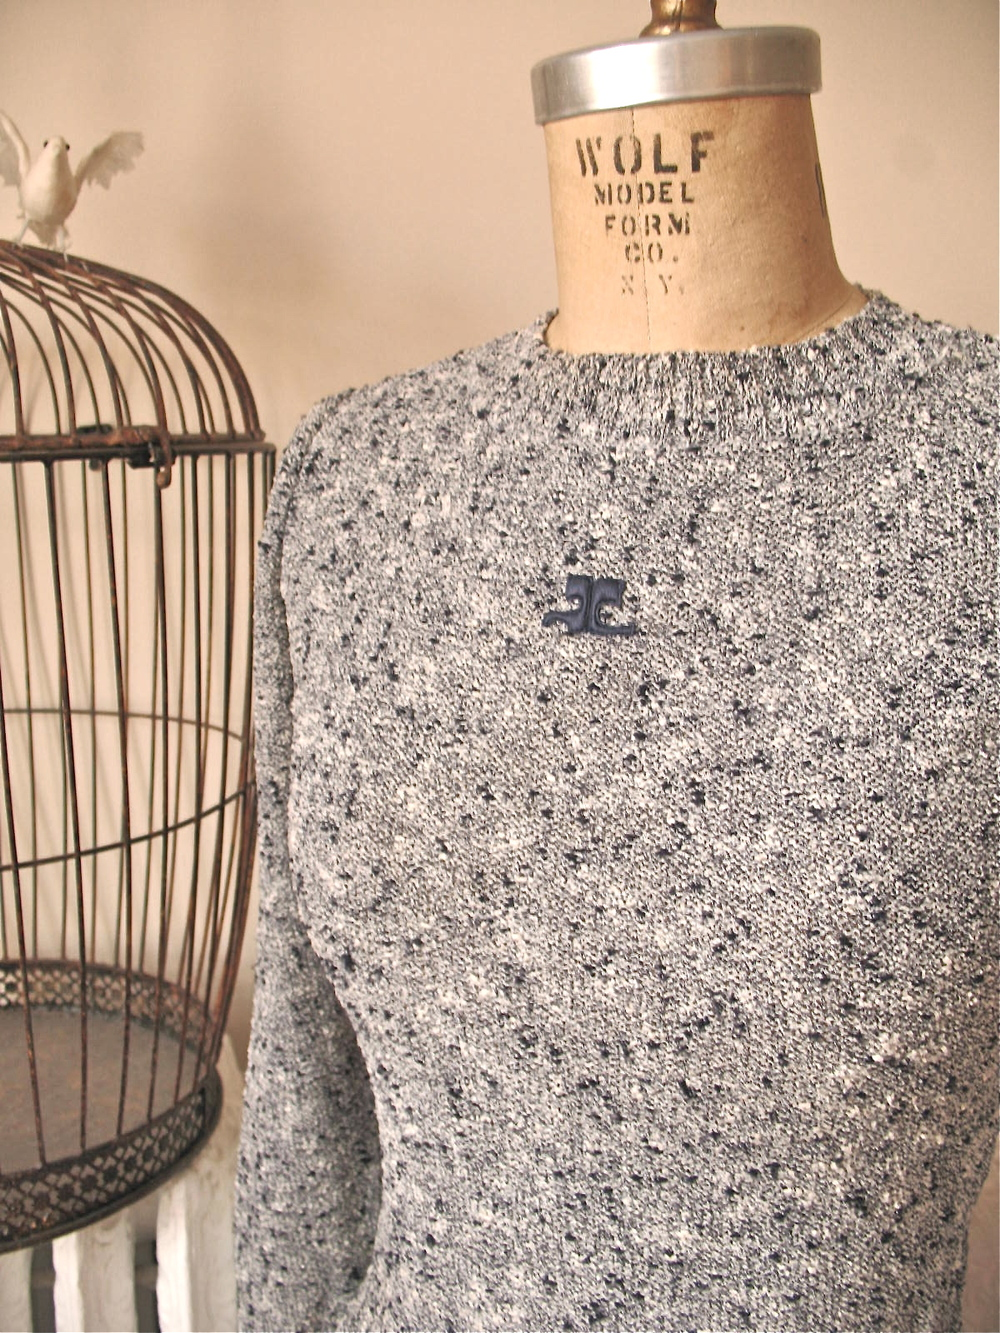 sweatergirl3.jpg